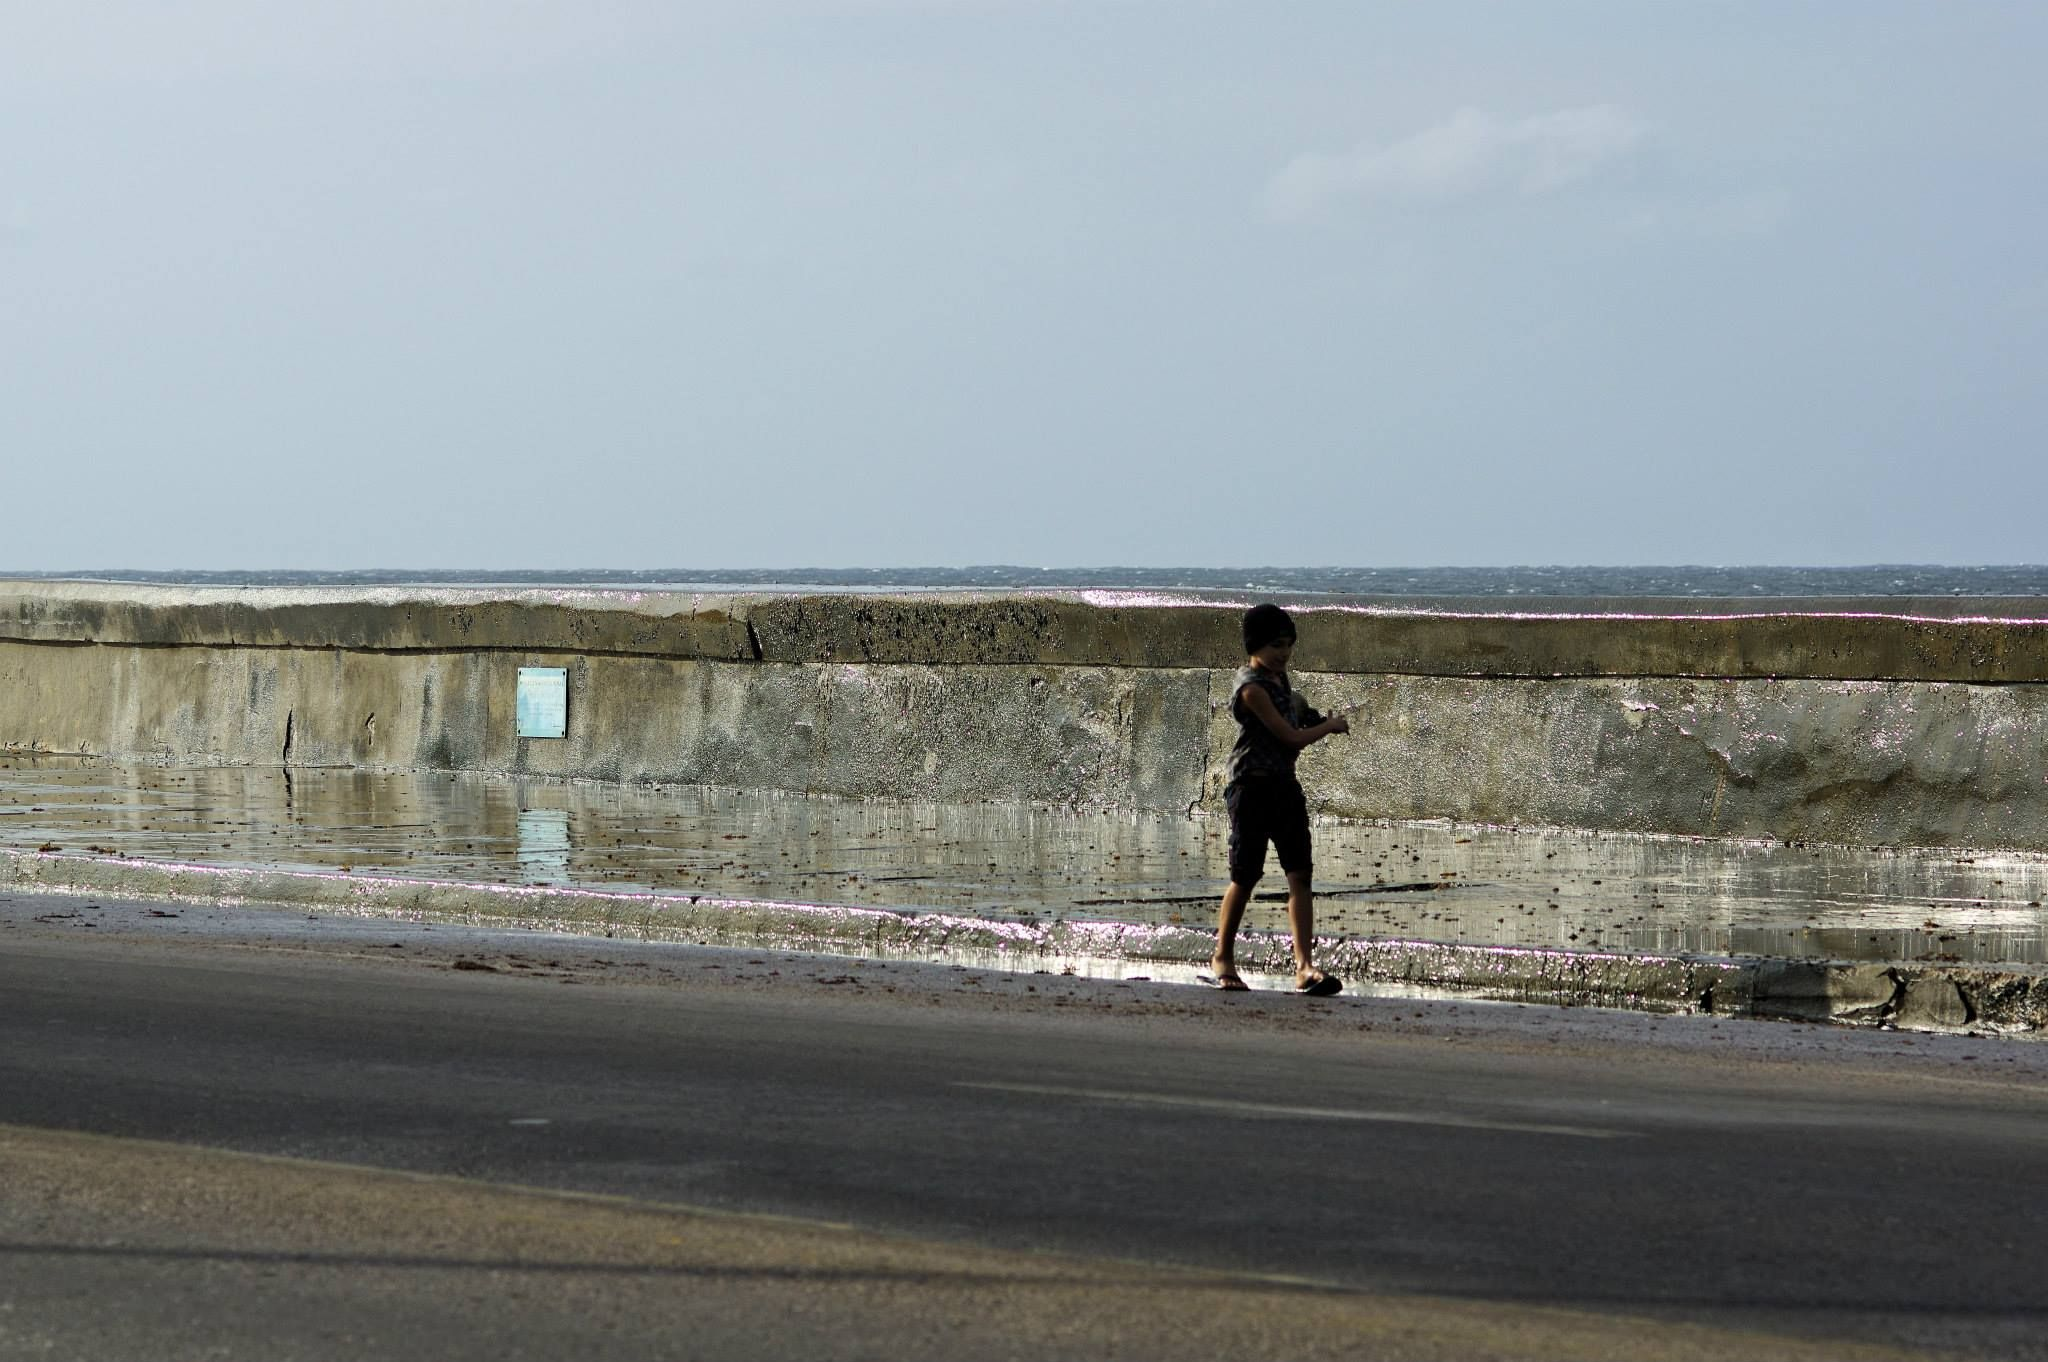 El Malecon, Habana, Cuba, par Lianet Jardines